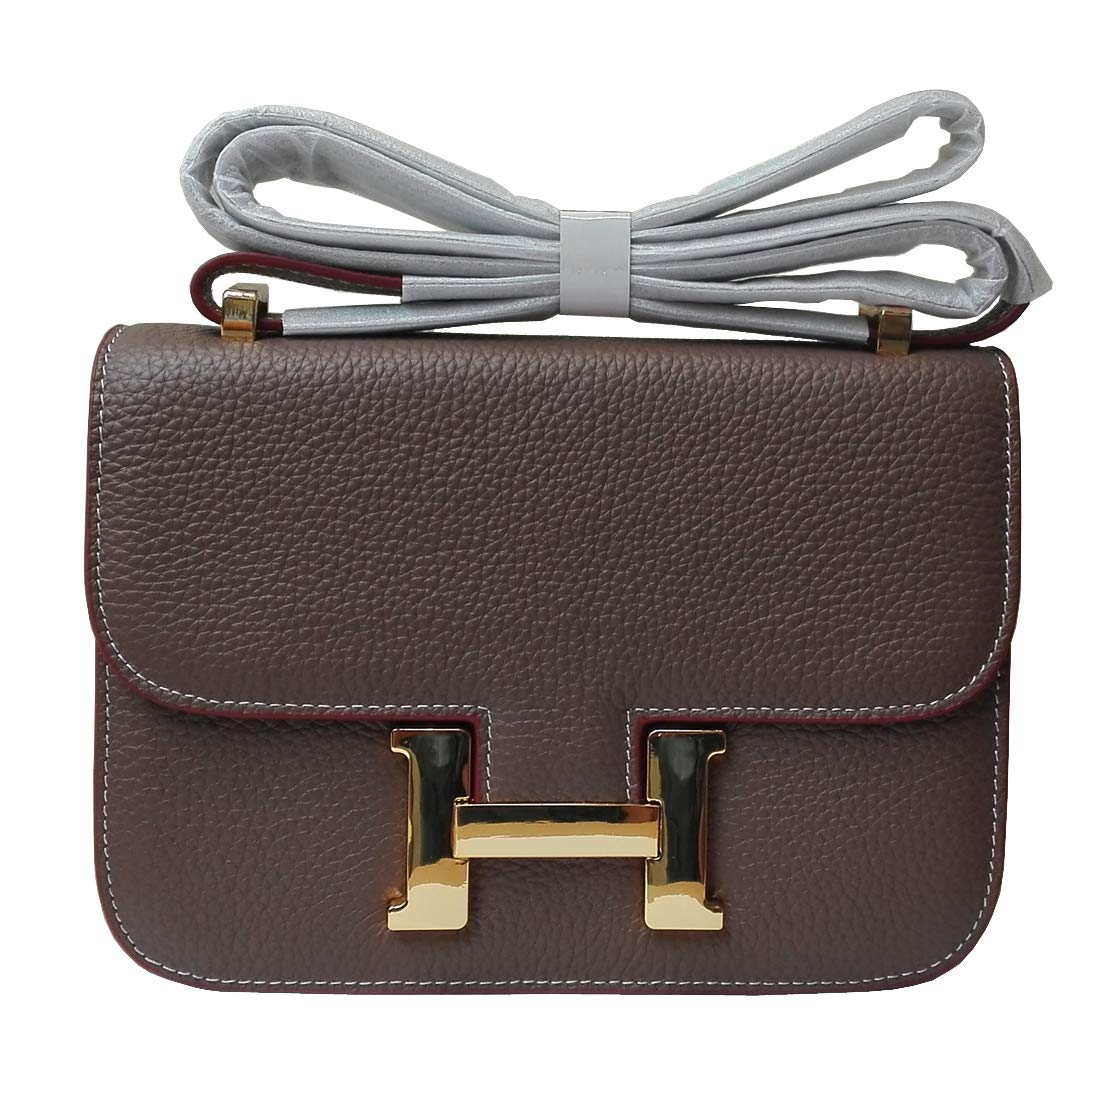 F.BLUE Genuine Leather Lady's Shoulder Bag Cowhide Women's Crossbody's Bag FB066 (Kaki)